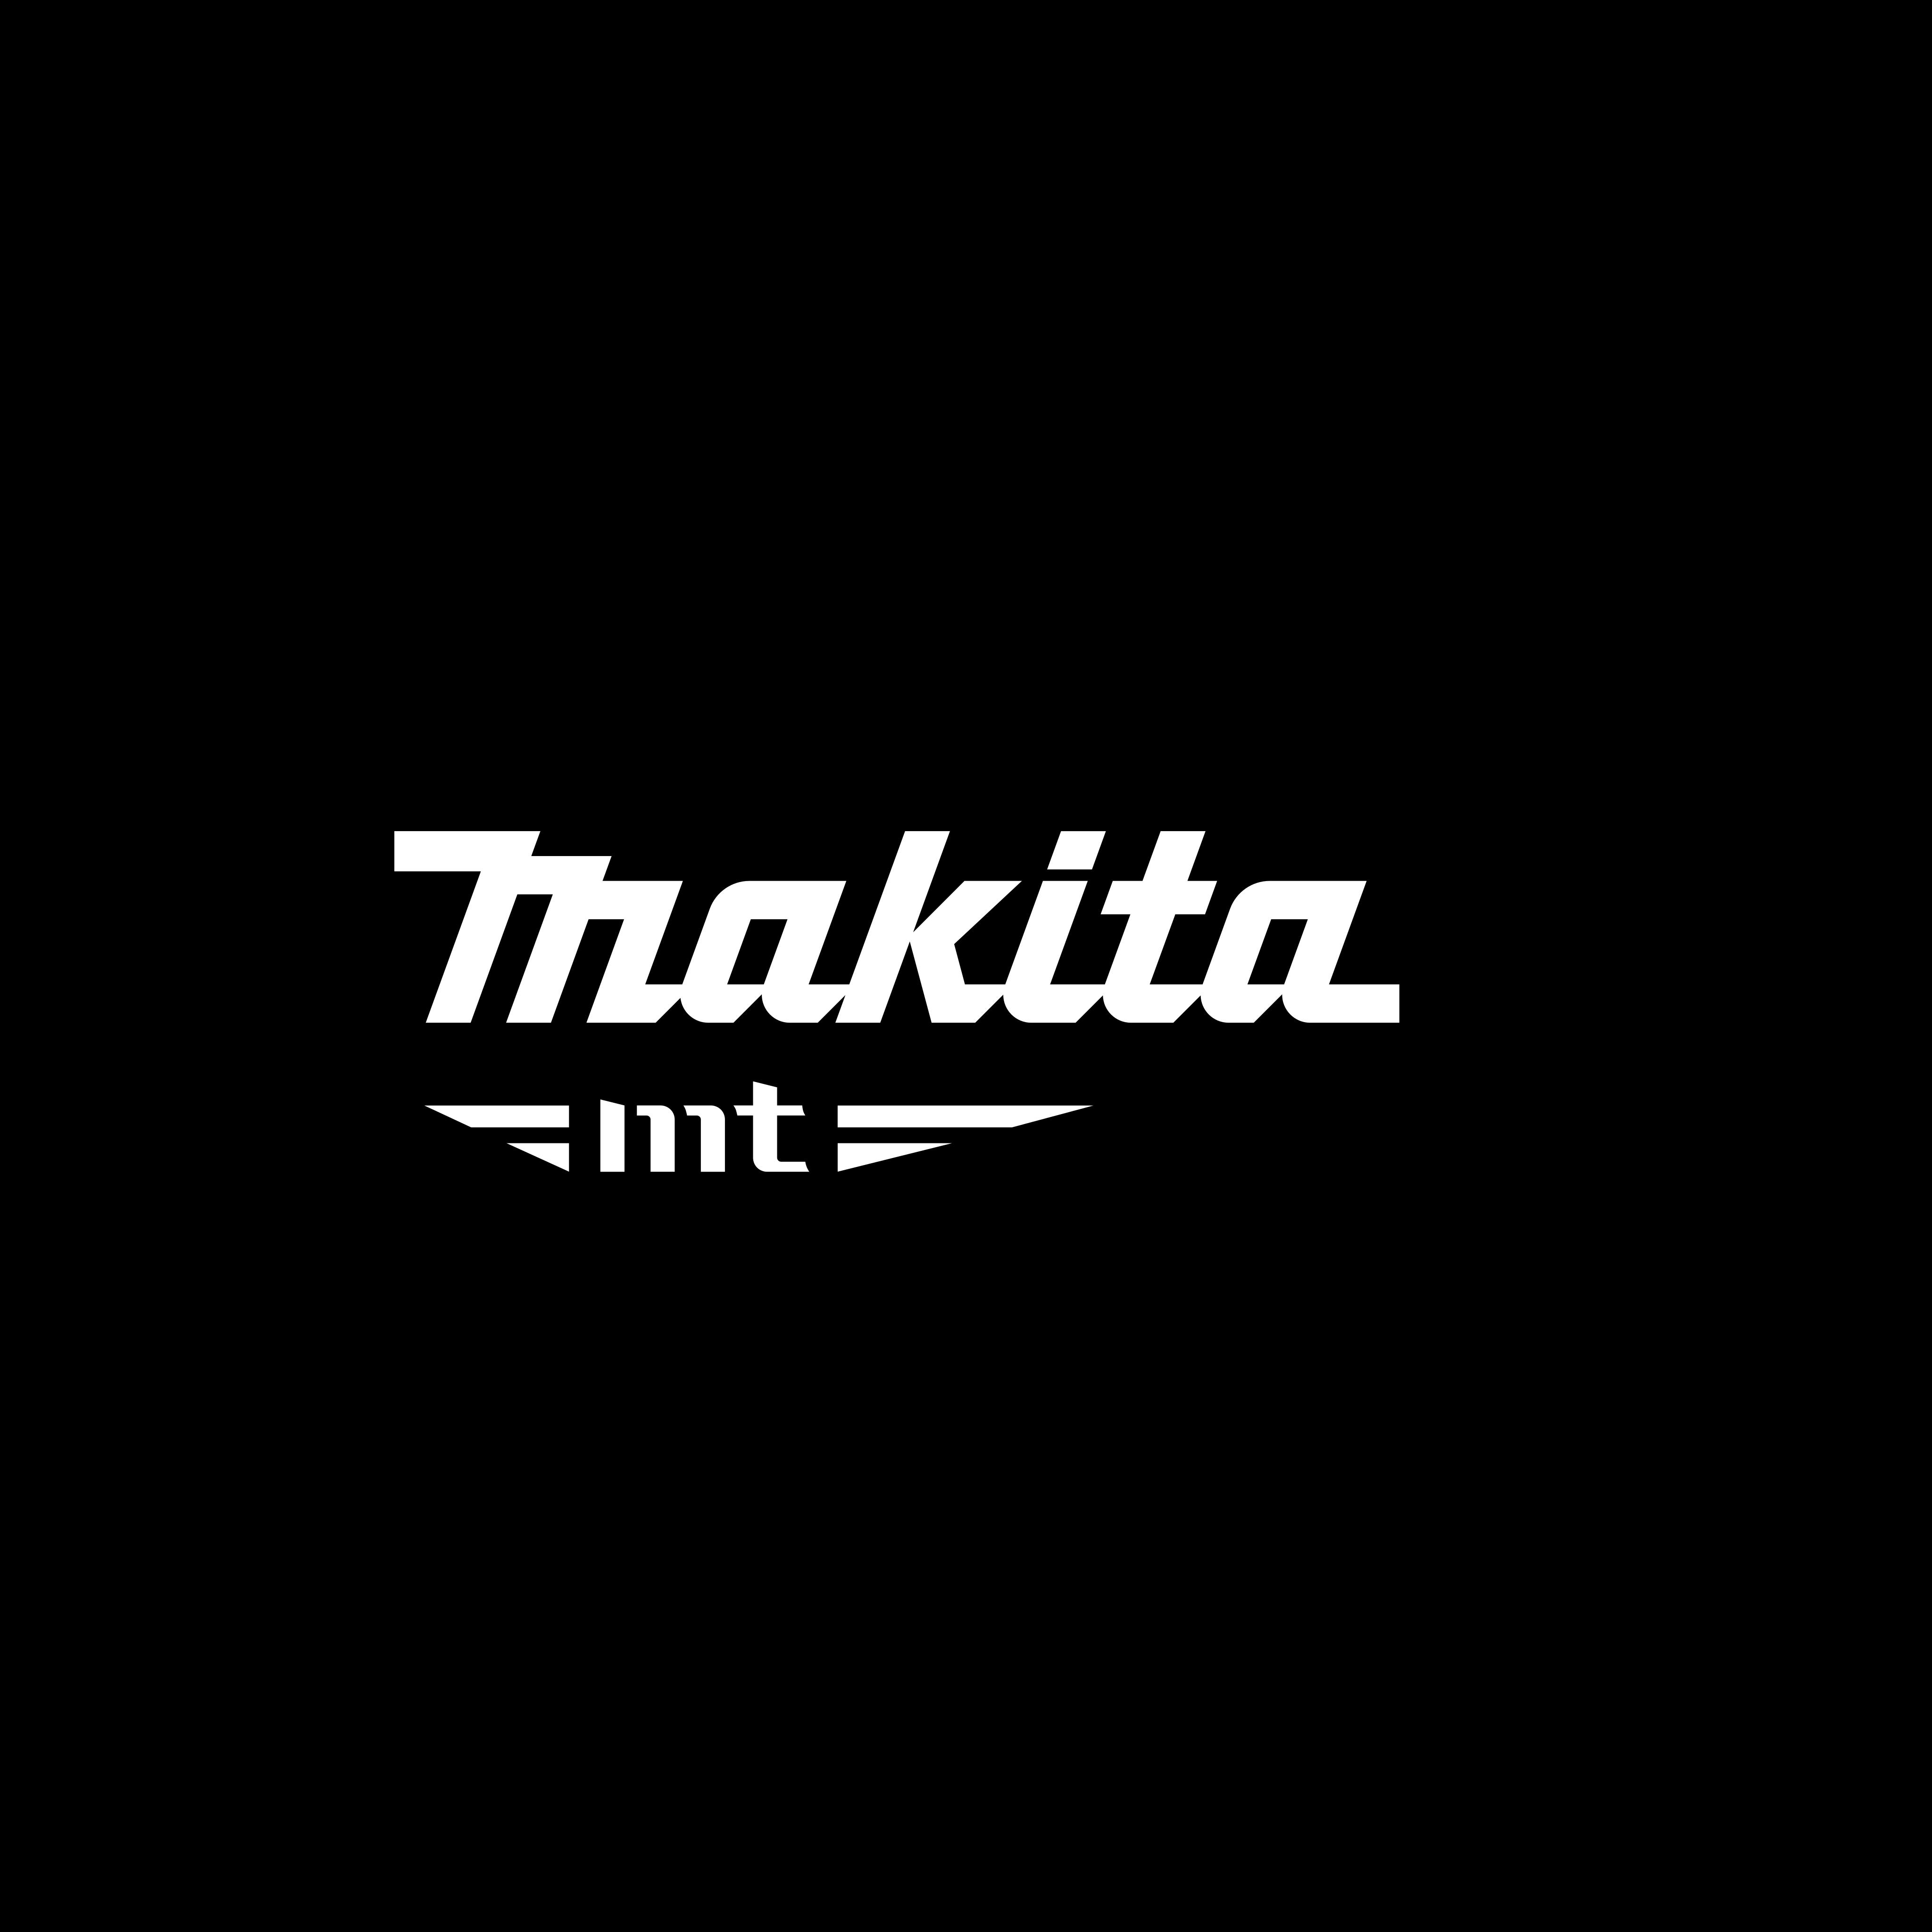 makita mt logo 0 - Makita MT Logo